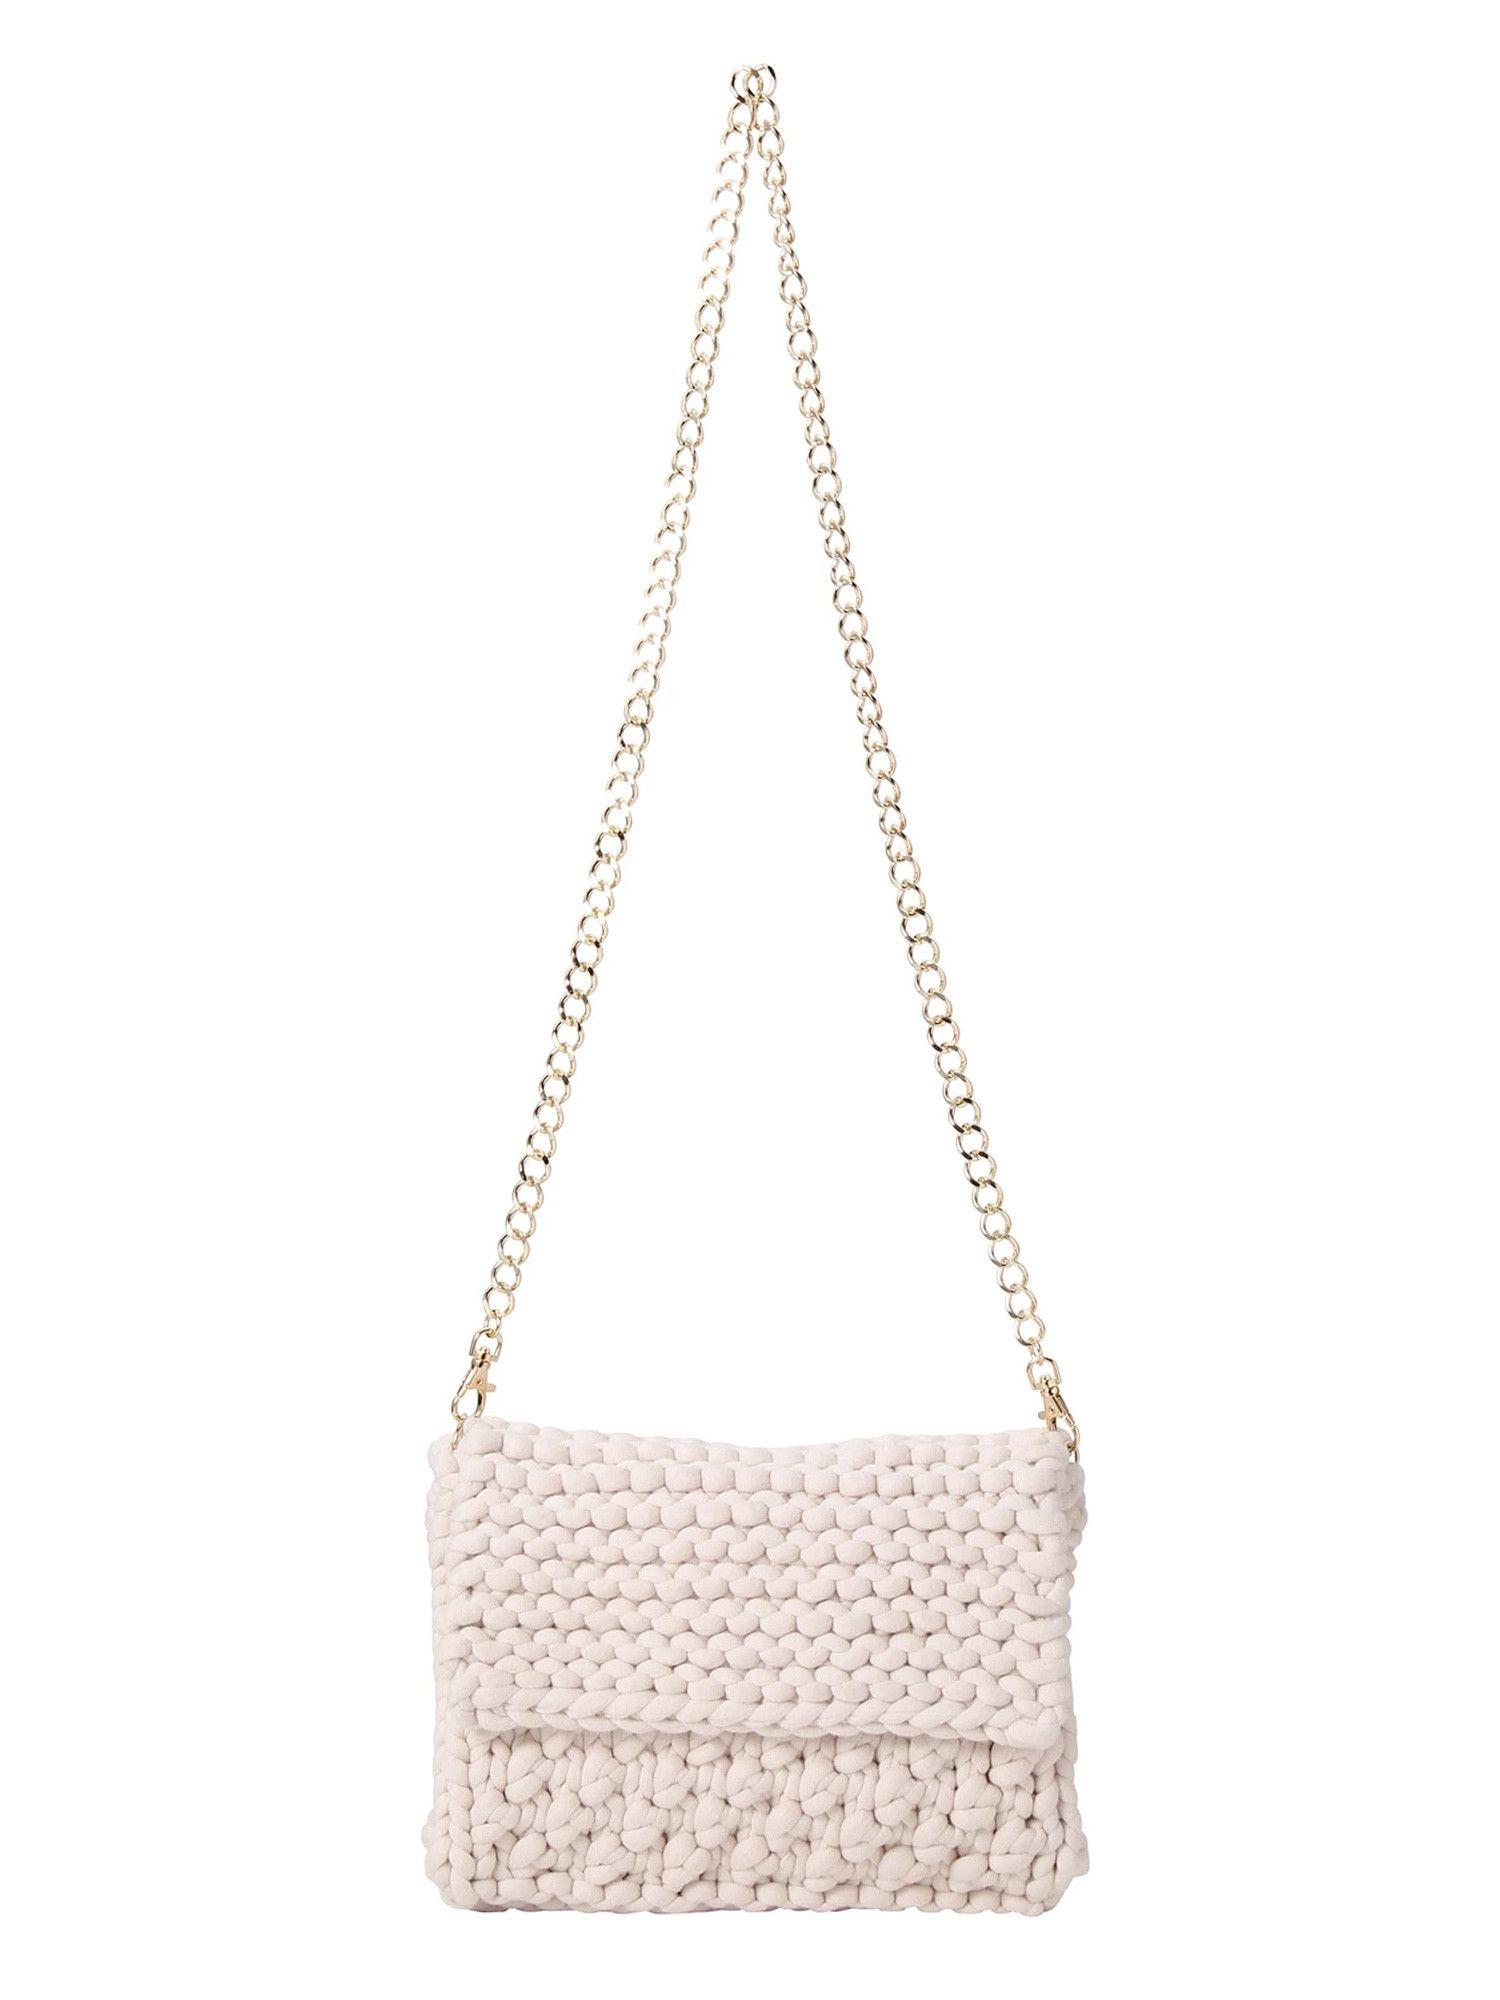 Hand knit pochette